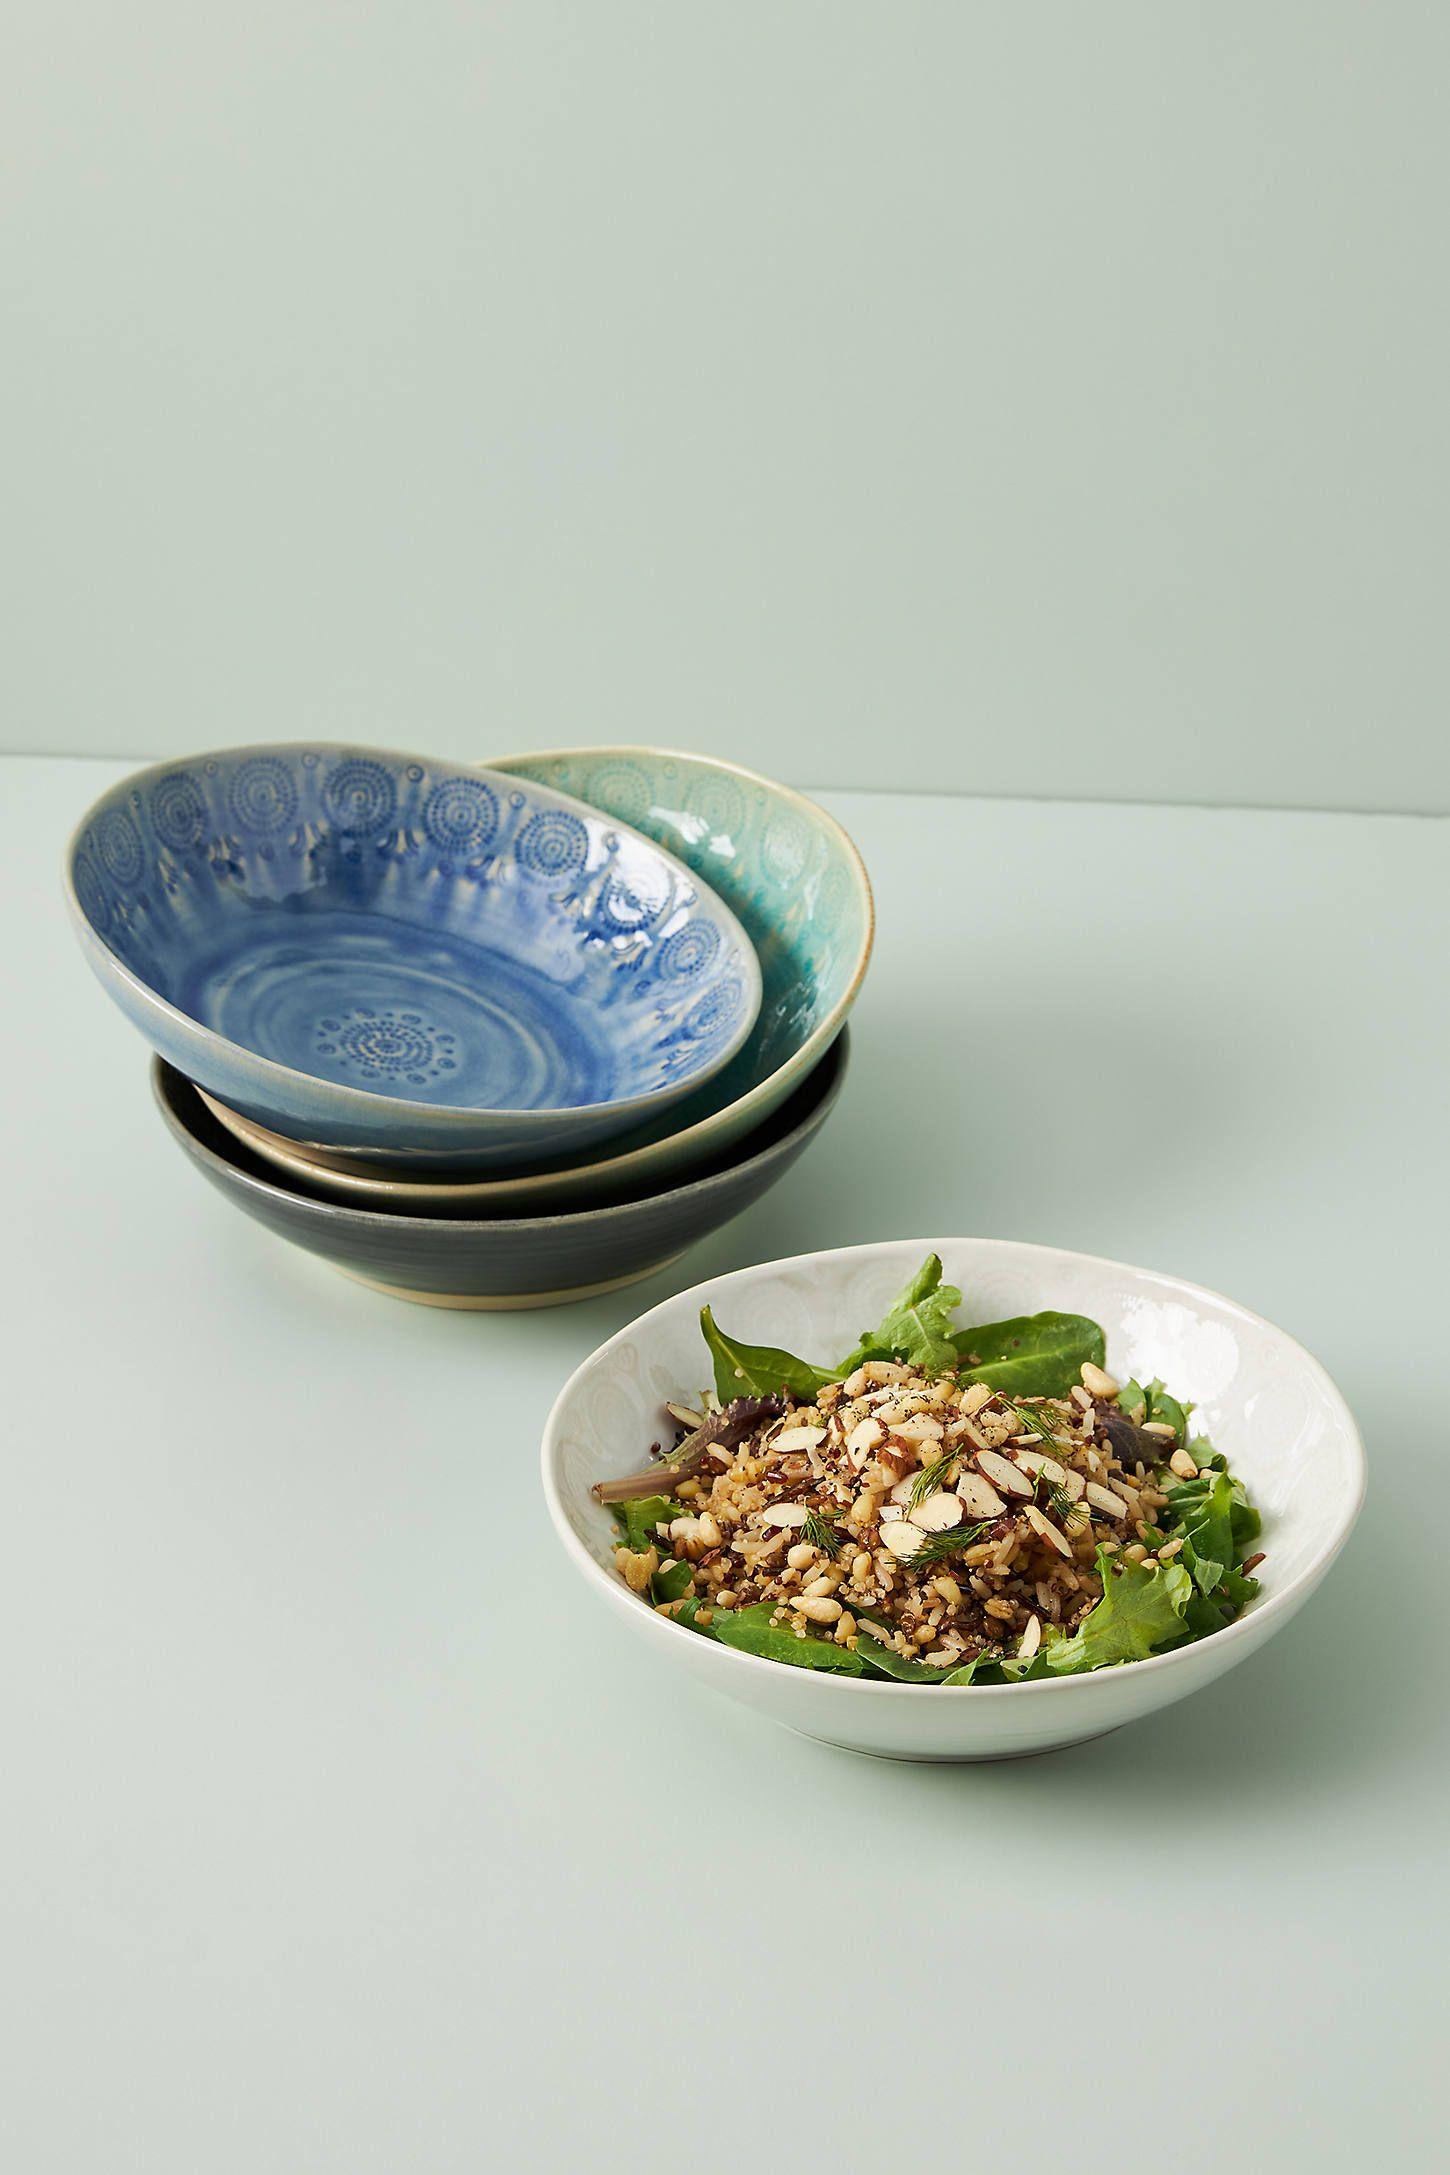 Old Havana Grain Bowls, Set of 4 by Anthropologie in Grey, Bowls